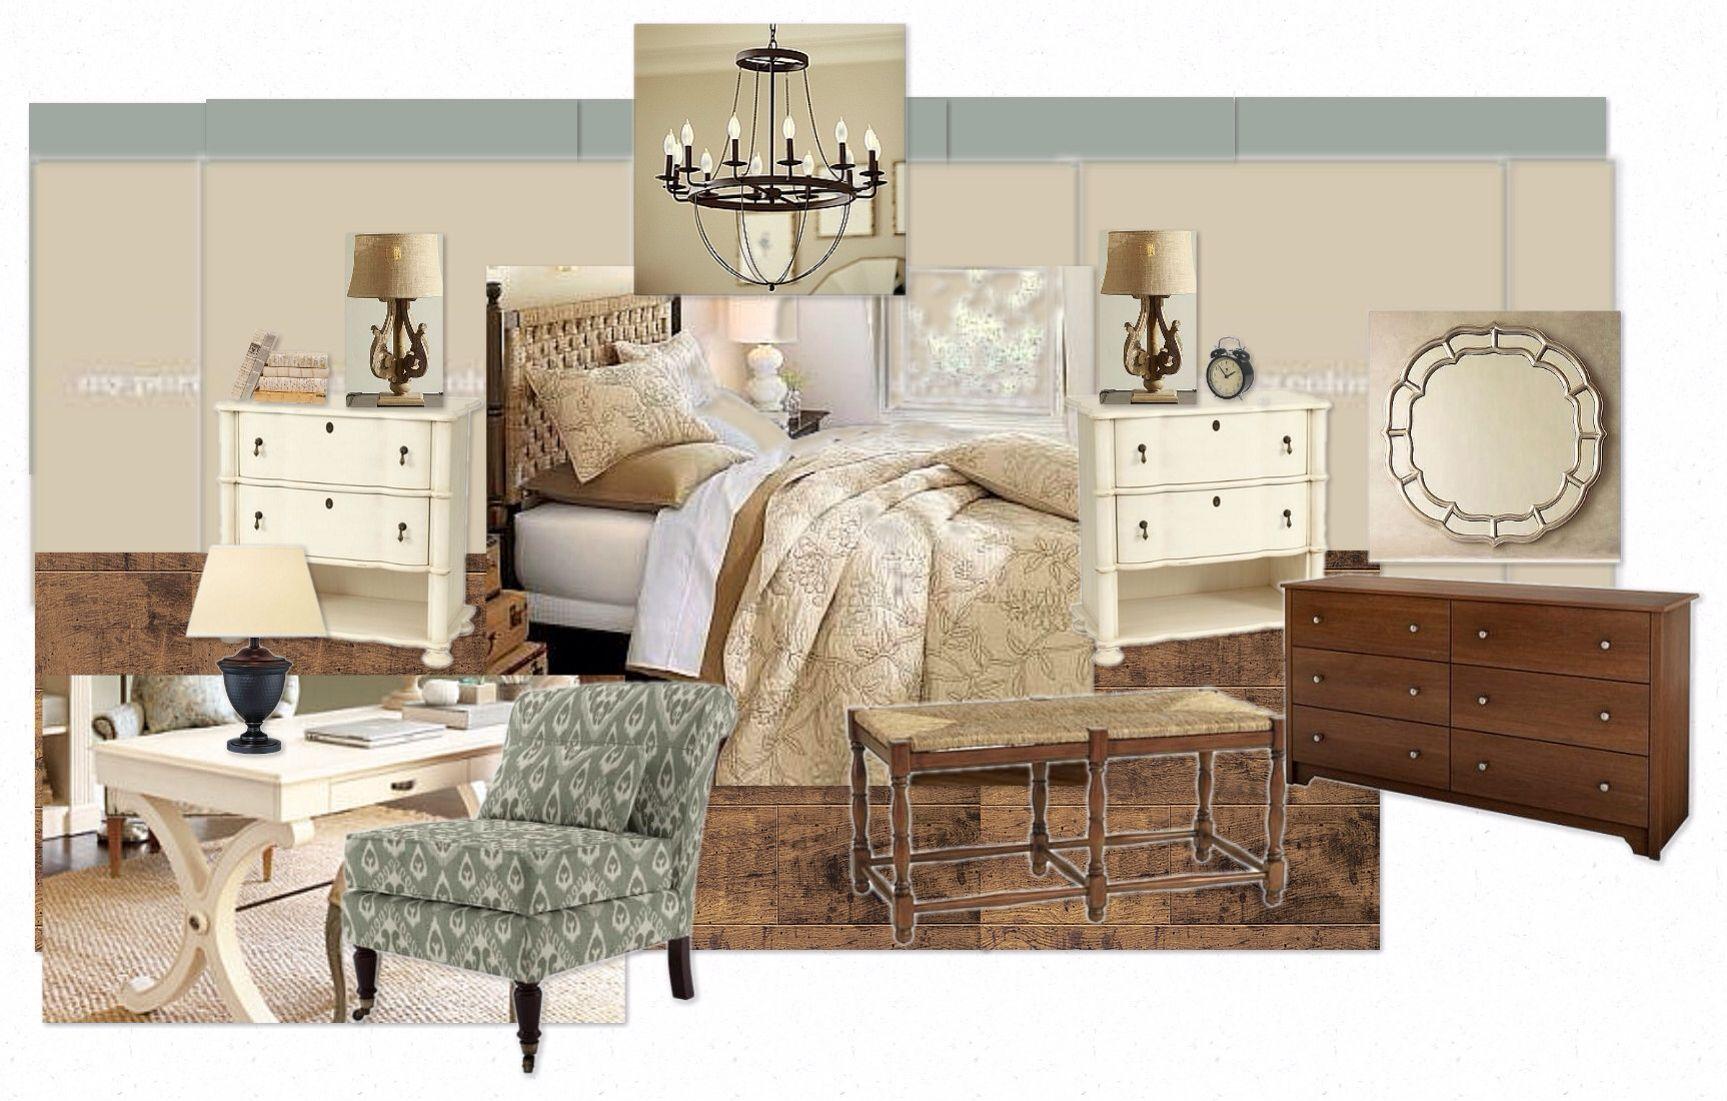 mismatched bedroom furniture ideas | design ideas 2017-2018 ...